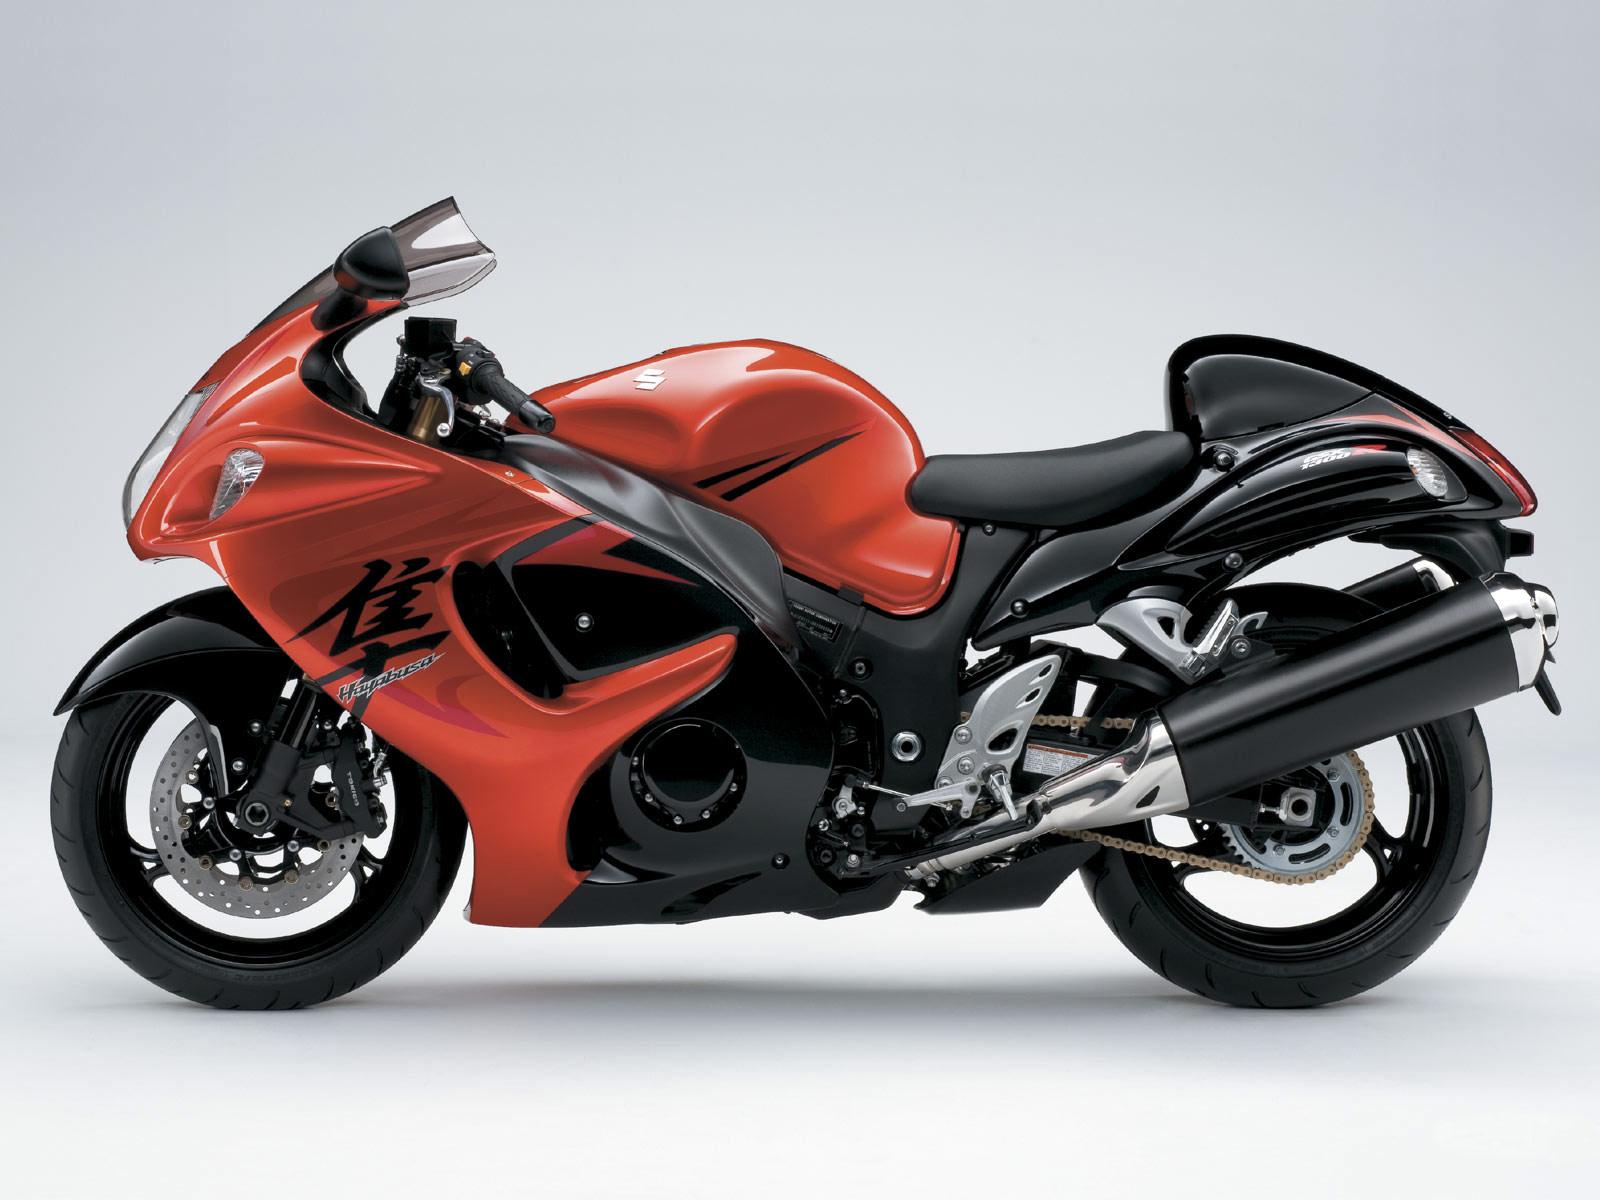 http://1.bp.blogspot.com/-eeqGxkZAMZw/Tpzl_zlgR4I/AAAAAAAACWs/sYIm9JpoD1s/s1600/2008_suzuki_GSX1300R_Hayabusa_motorcycle-desktop-wallpaper_04.jpg